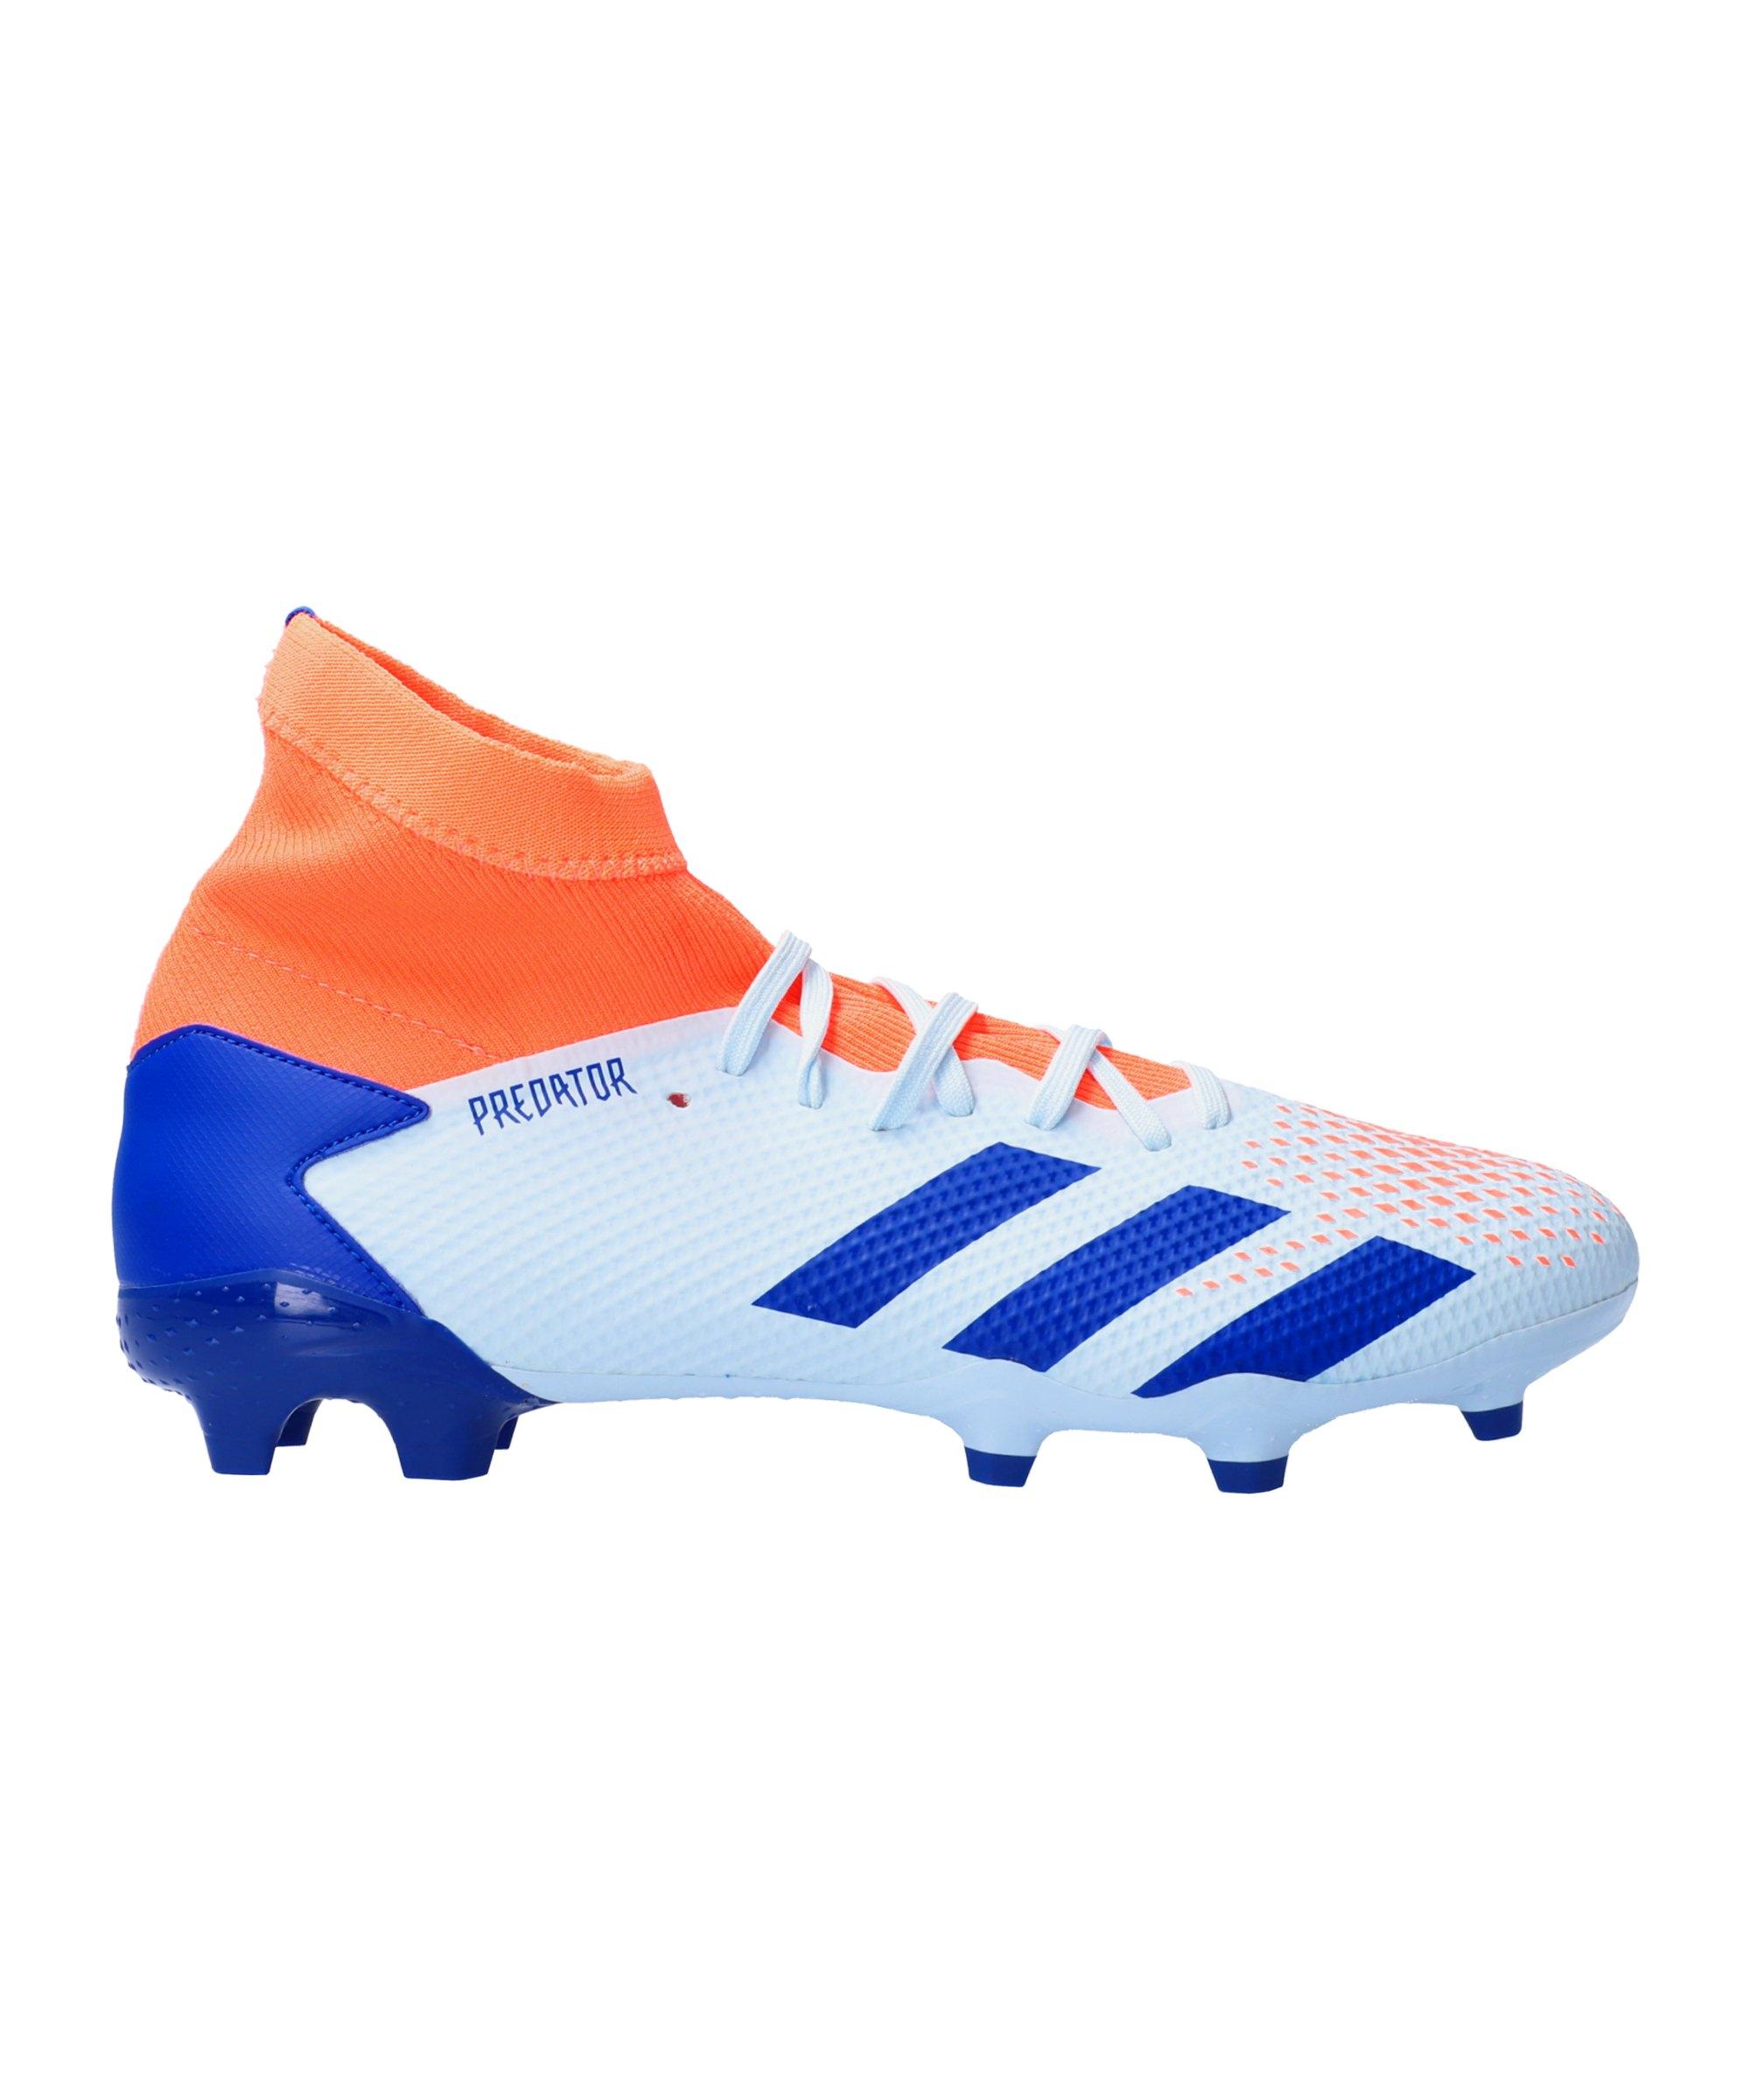 adidas Predator Glory Hunter 20.3 FG Blau Orange - blau